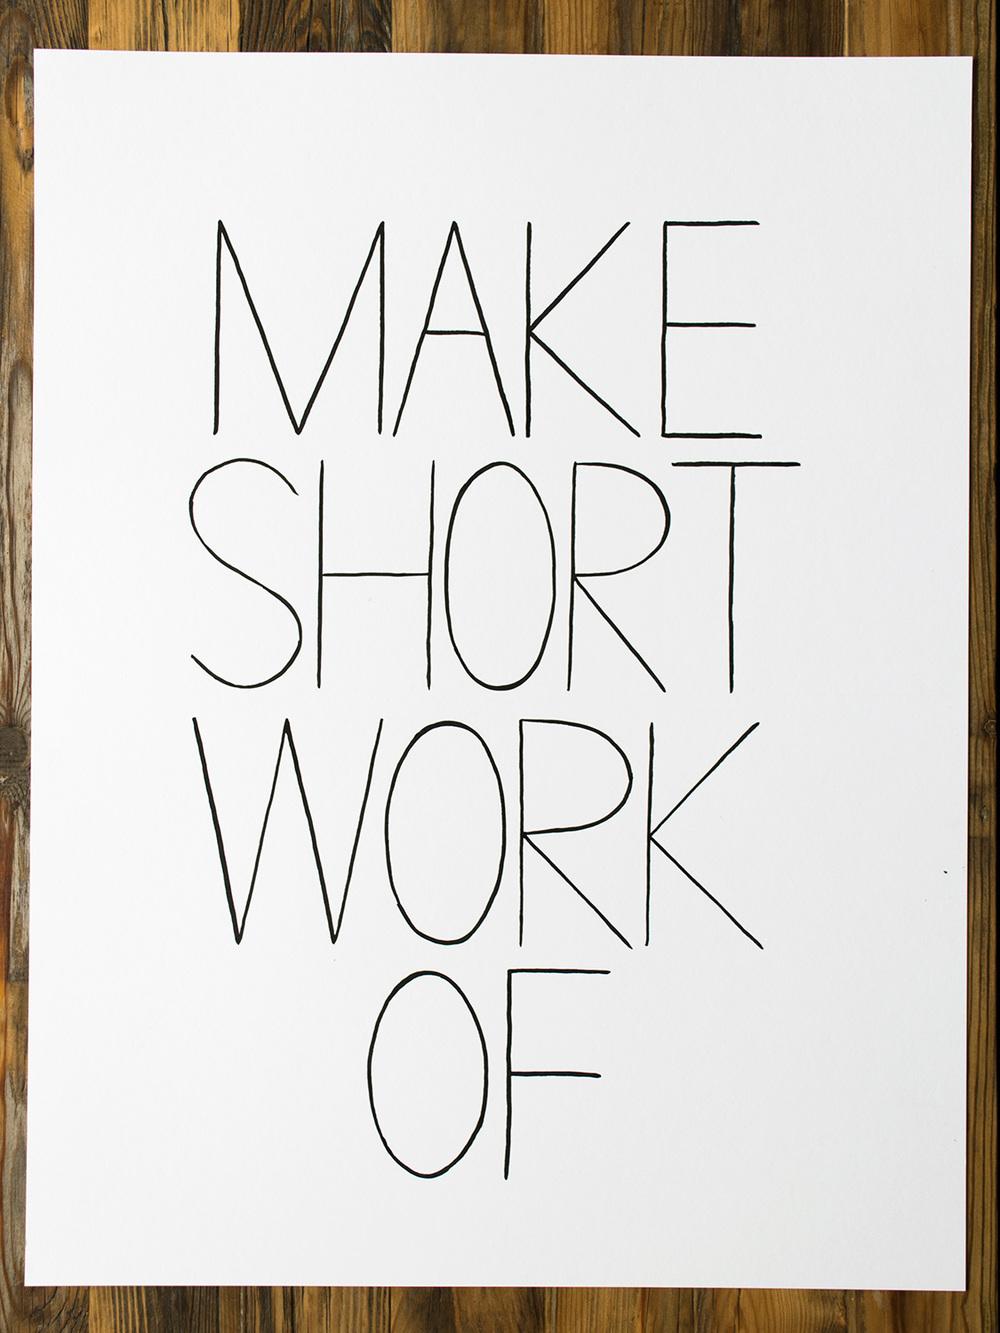 make_short_work_of-1500x1125.jpg